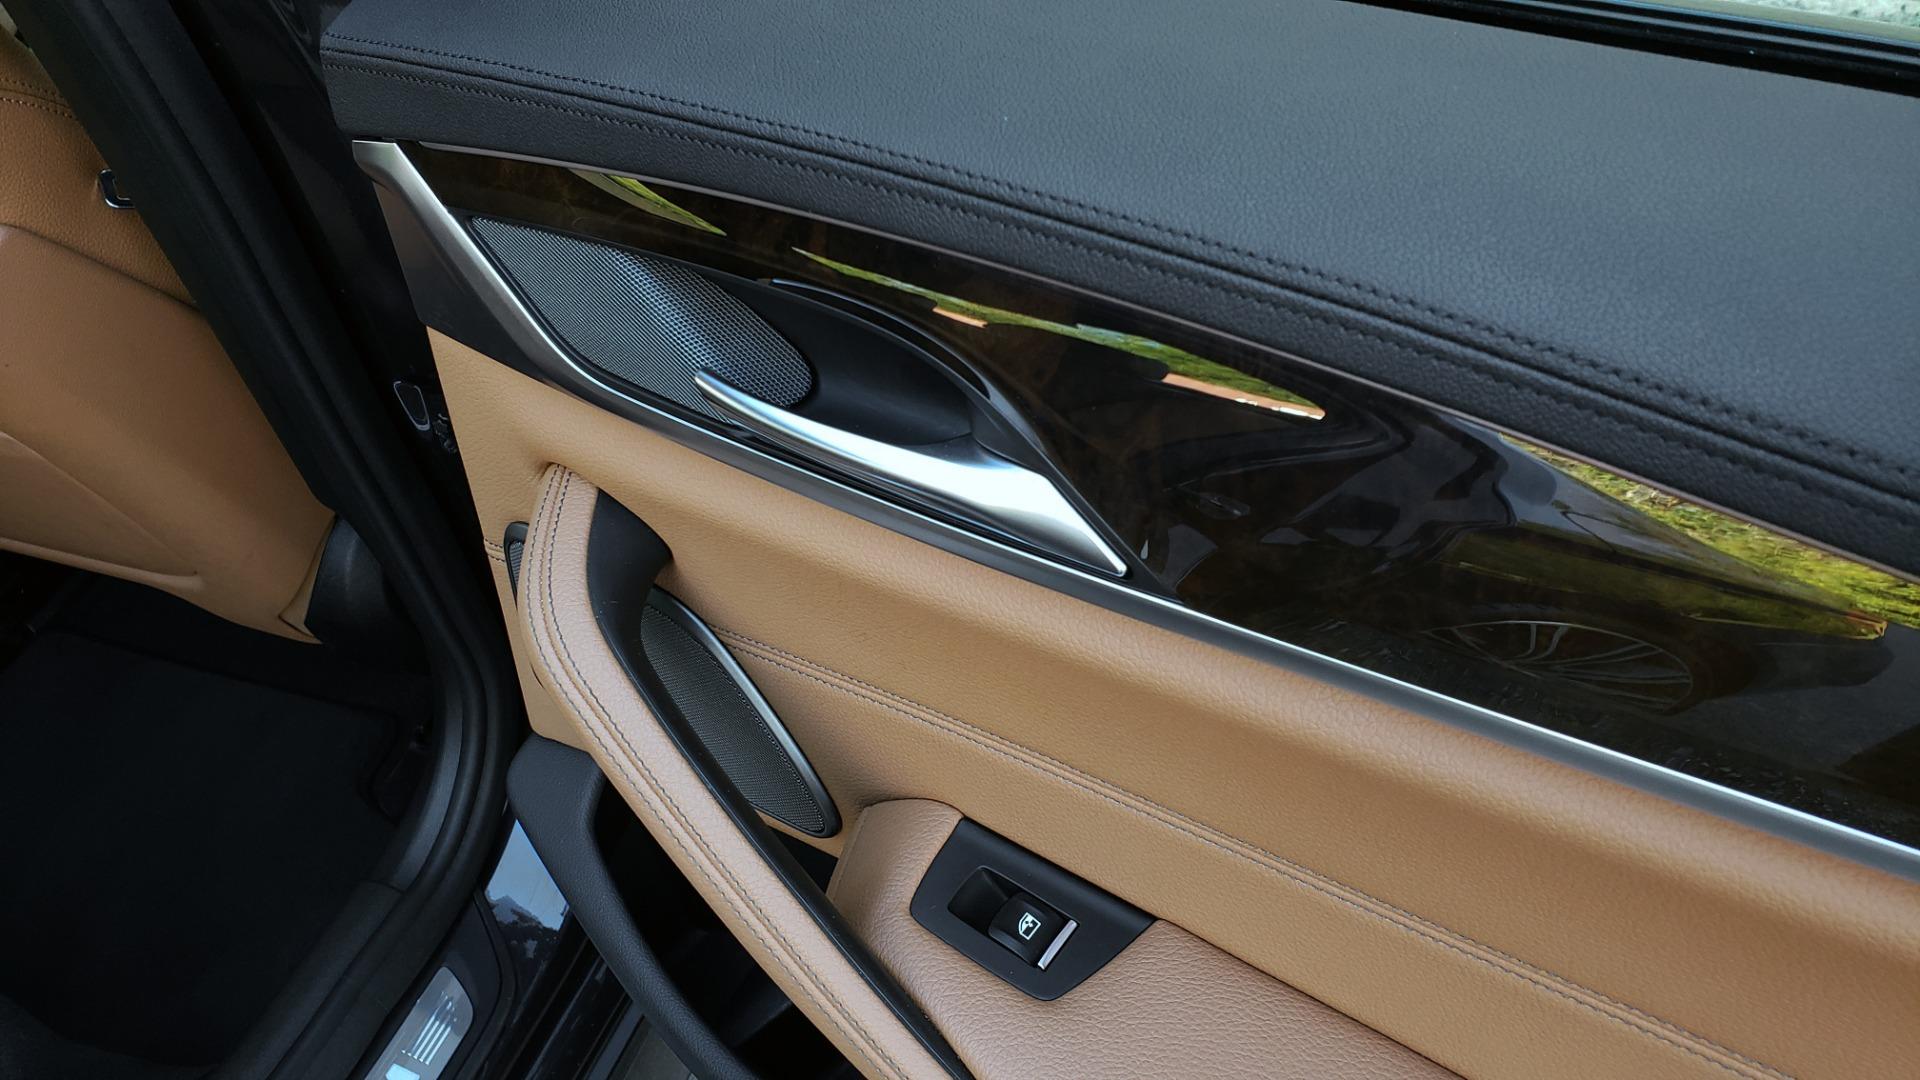 Used 2018 BMW 5 SERIES 540I M-SPORT / DRVR ASST / EXEC PKG / NAV / SUNROOF / HUD / REARVIEW for sale Sold at Formula Imports in Charlotte NC 28227 70